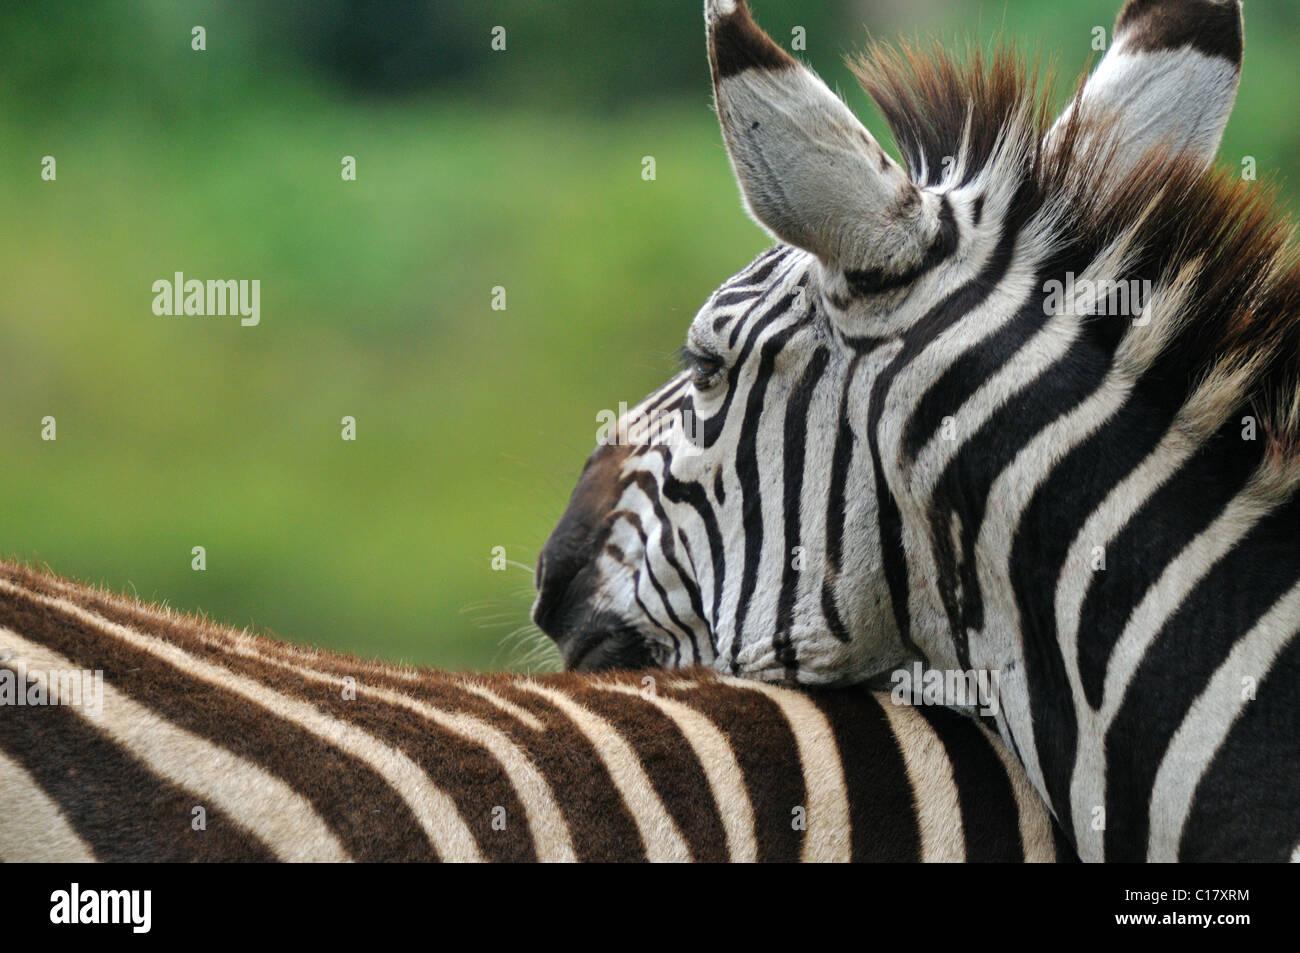 Zebra près d'Arusha en Tanzanie Photo Stock